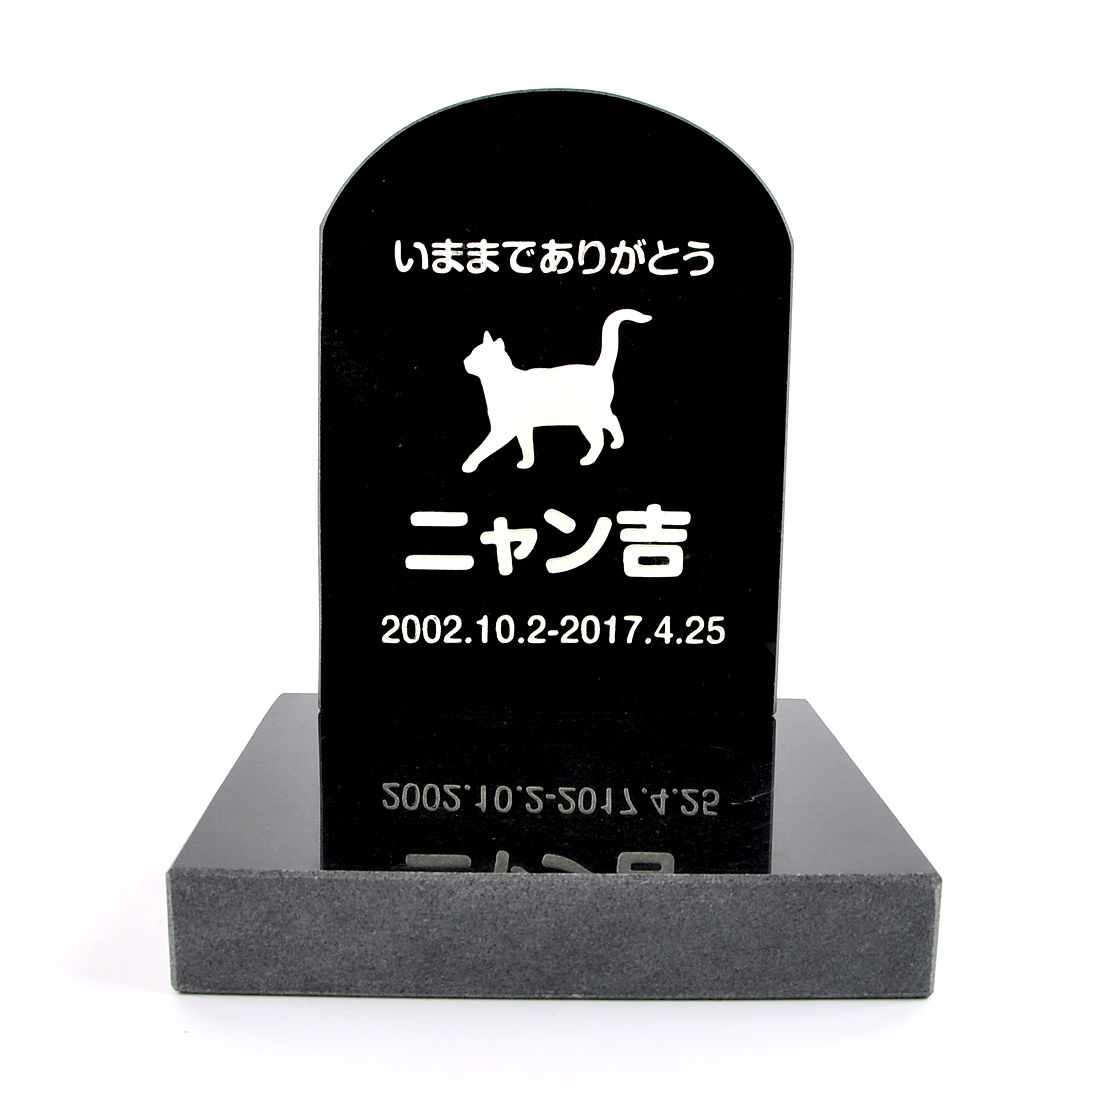 Pet&Love. ペットのお墓 天然石製 セット型 底板が厚く重いタイプ 御影石 ブラック スタンダード  【HLS_DU】【楽ギフ_名入れ】 attr177attr ctgr2ctgr sml3sml+ctgr2ctgr CAT